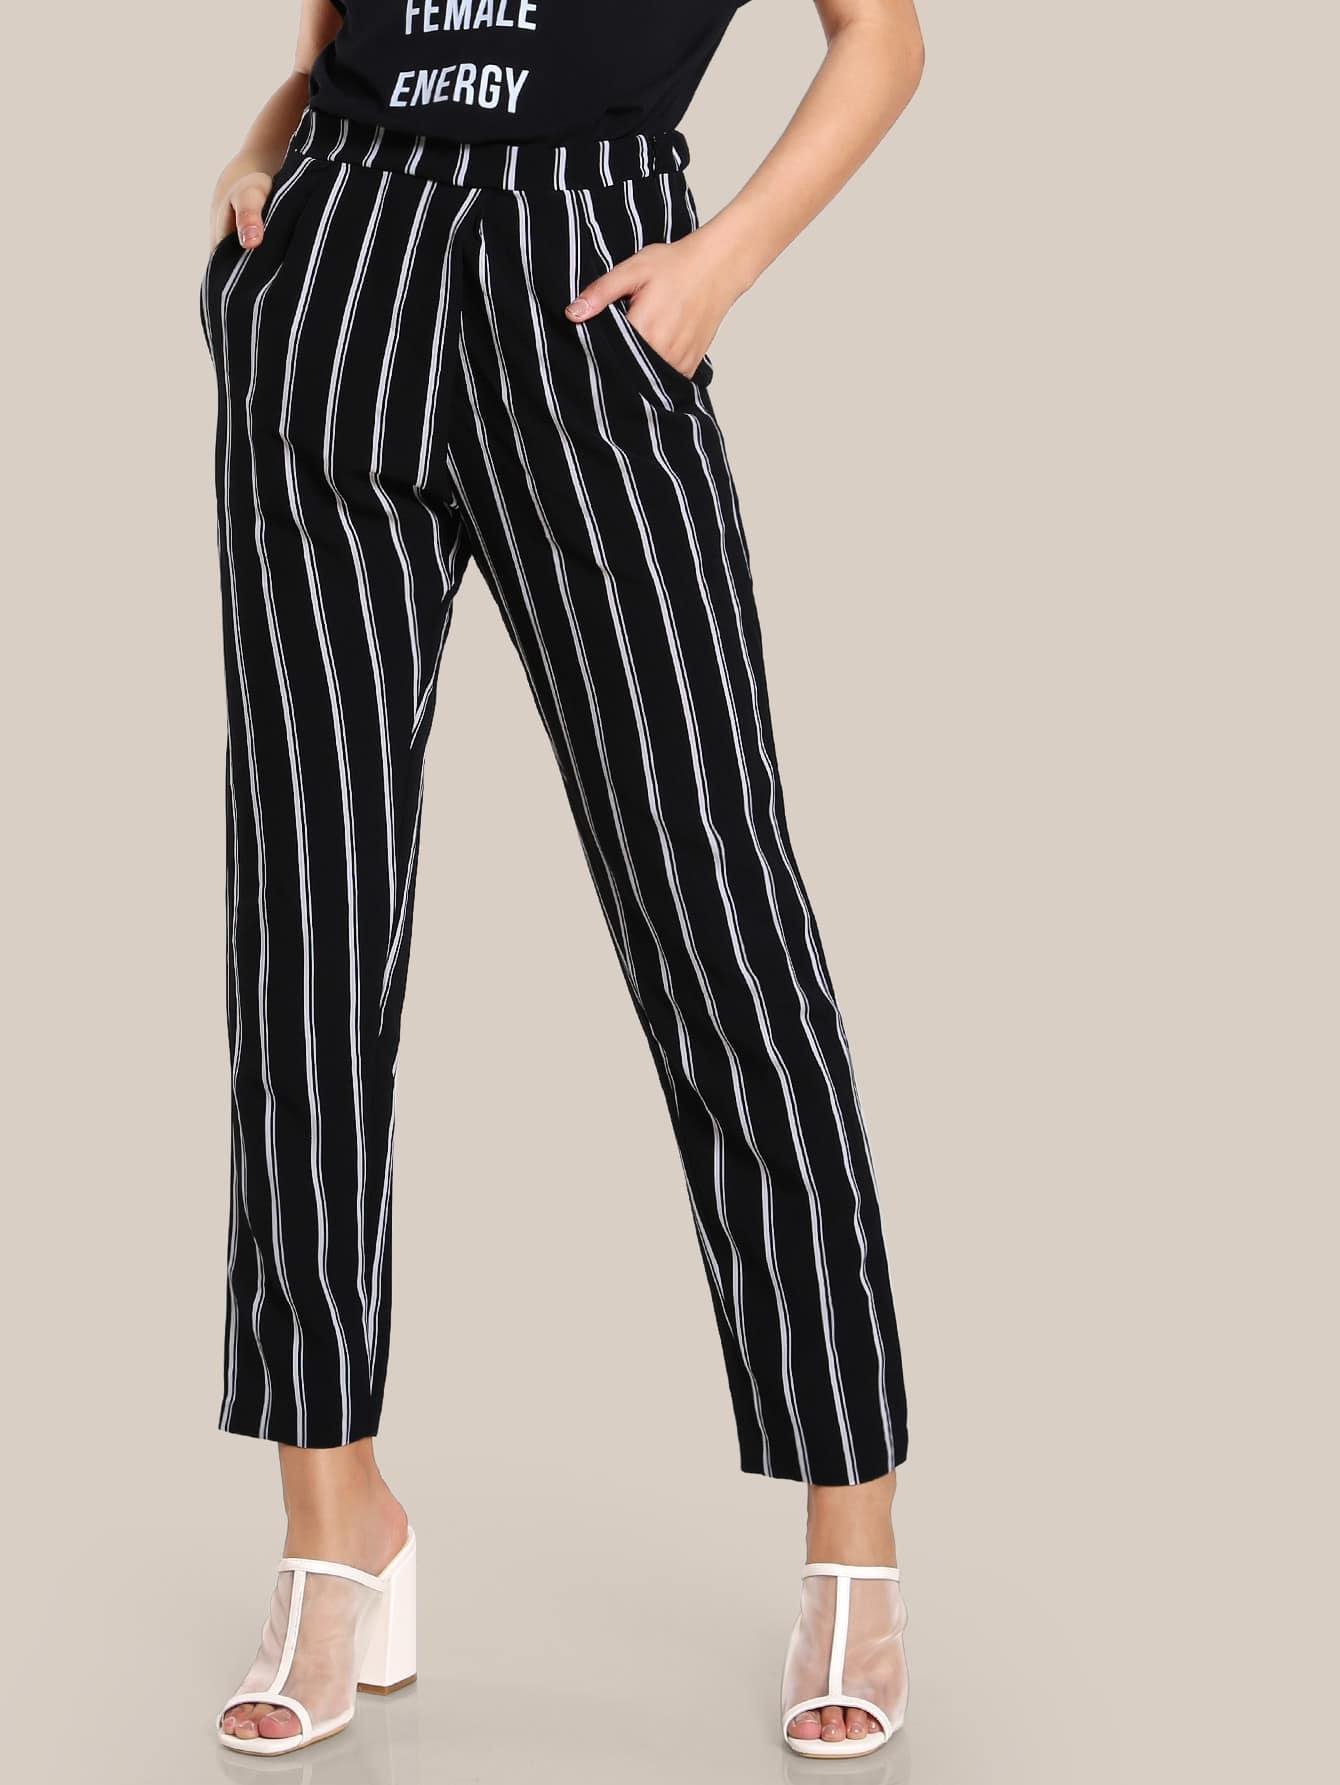 Striped High Rise Peg Pants high rise coated skinny pants